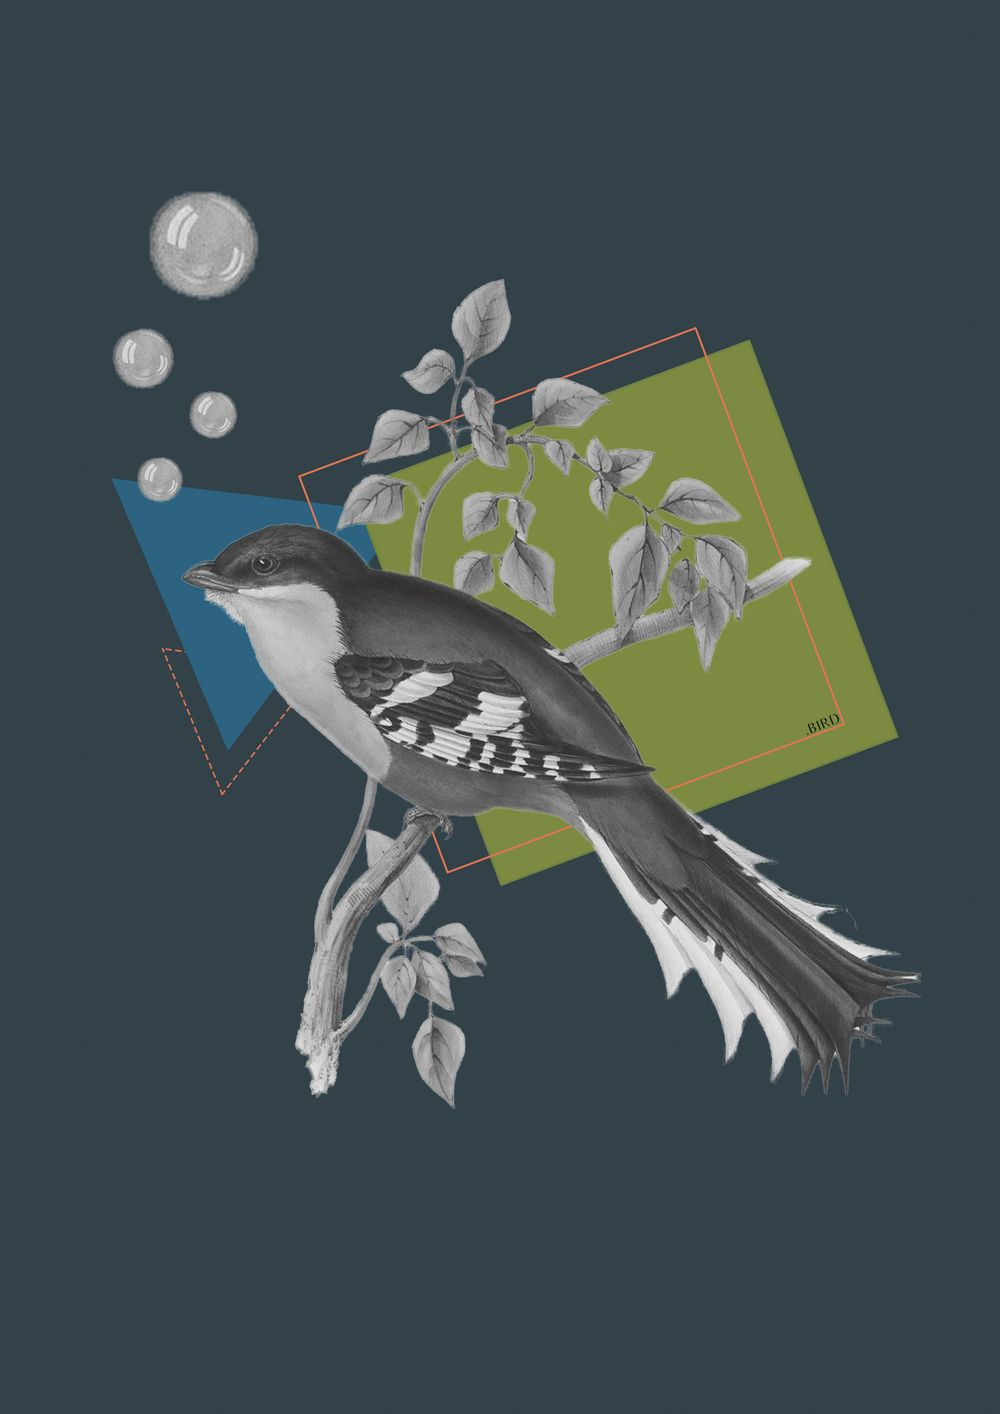 Vintage bird - image 2 - student project